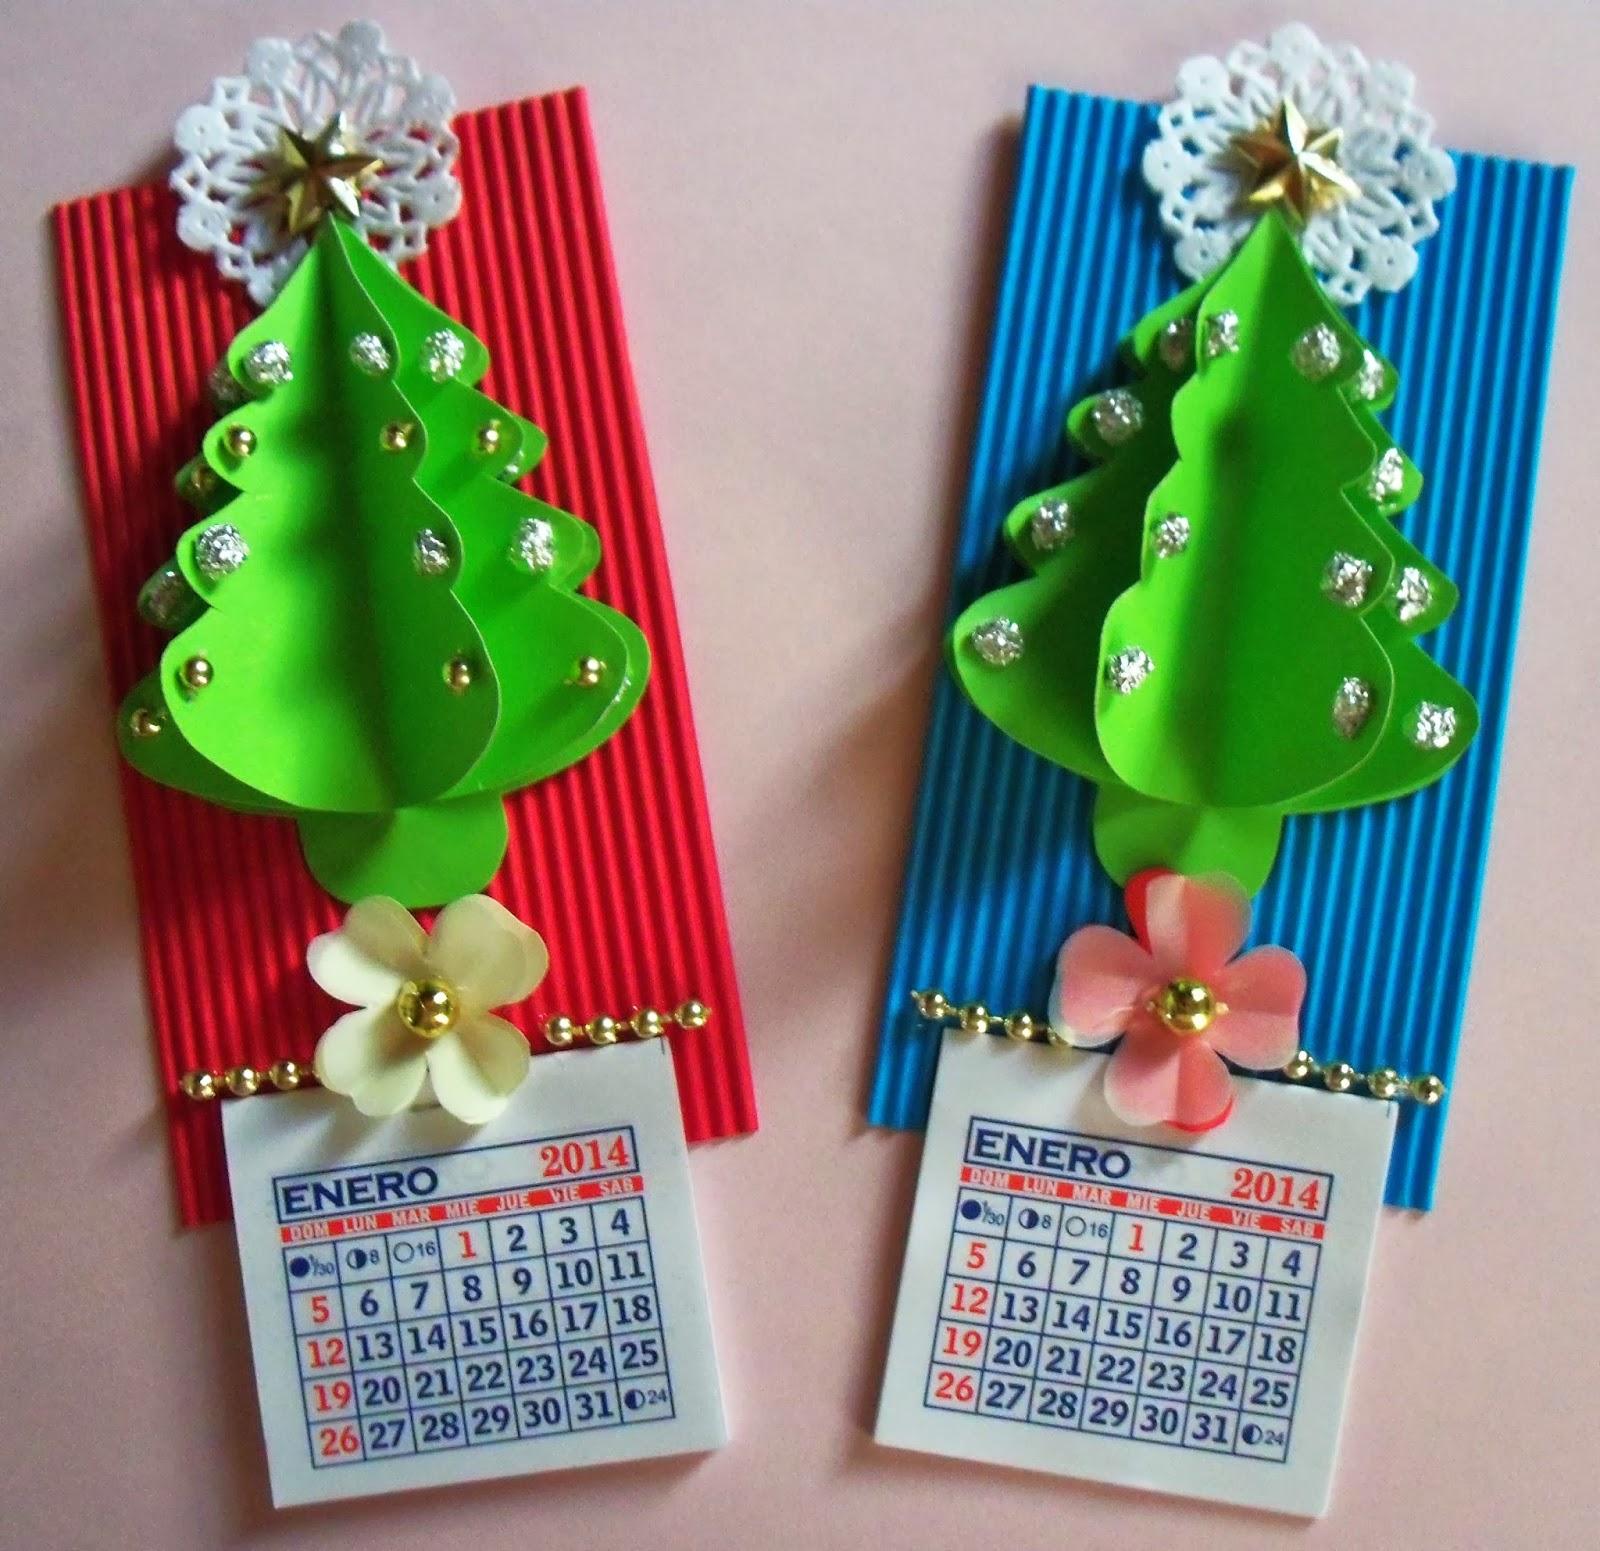 La catequesis el blog de sandra manualidades de navidad - Tarjetas de navidad manuales ...